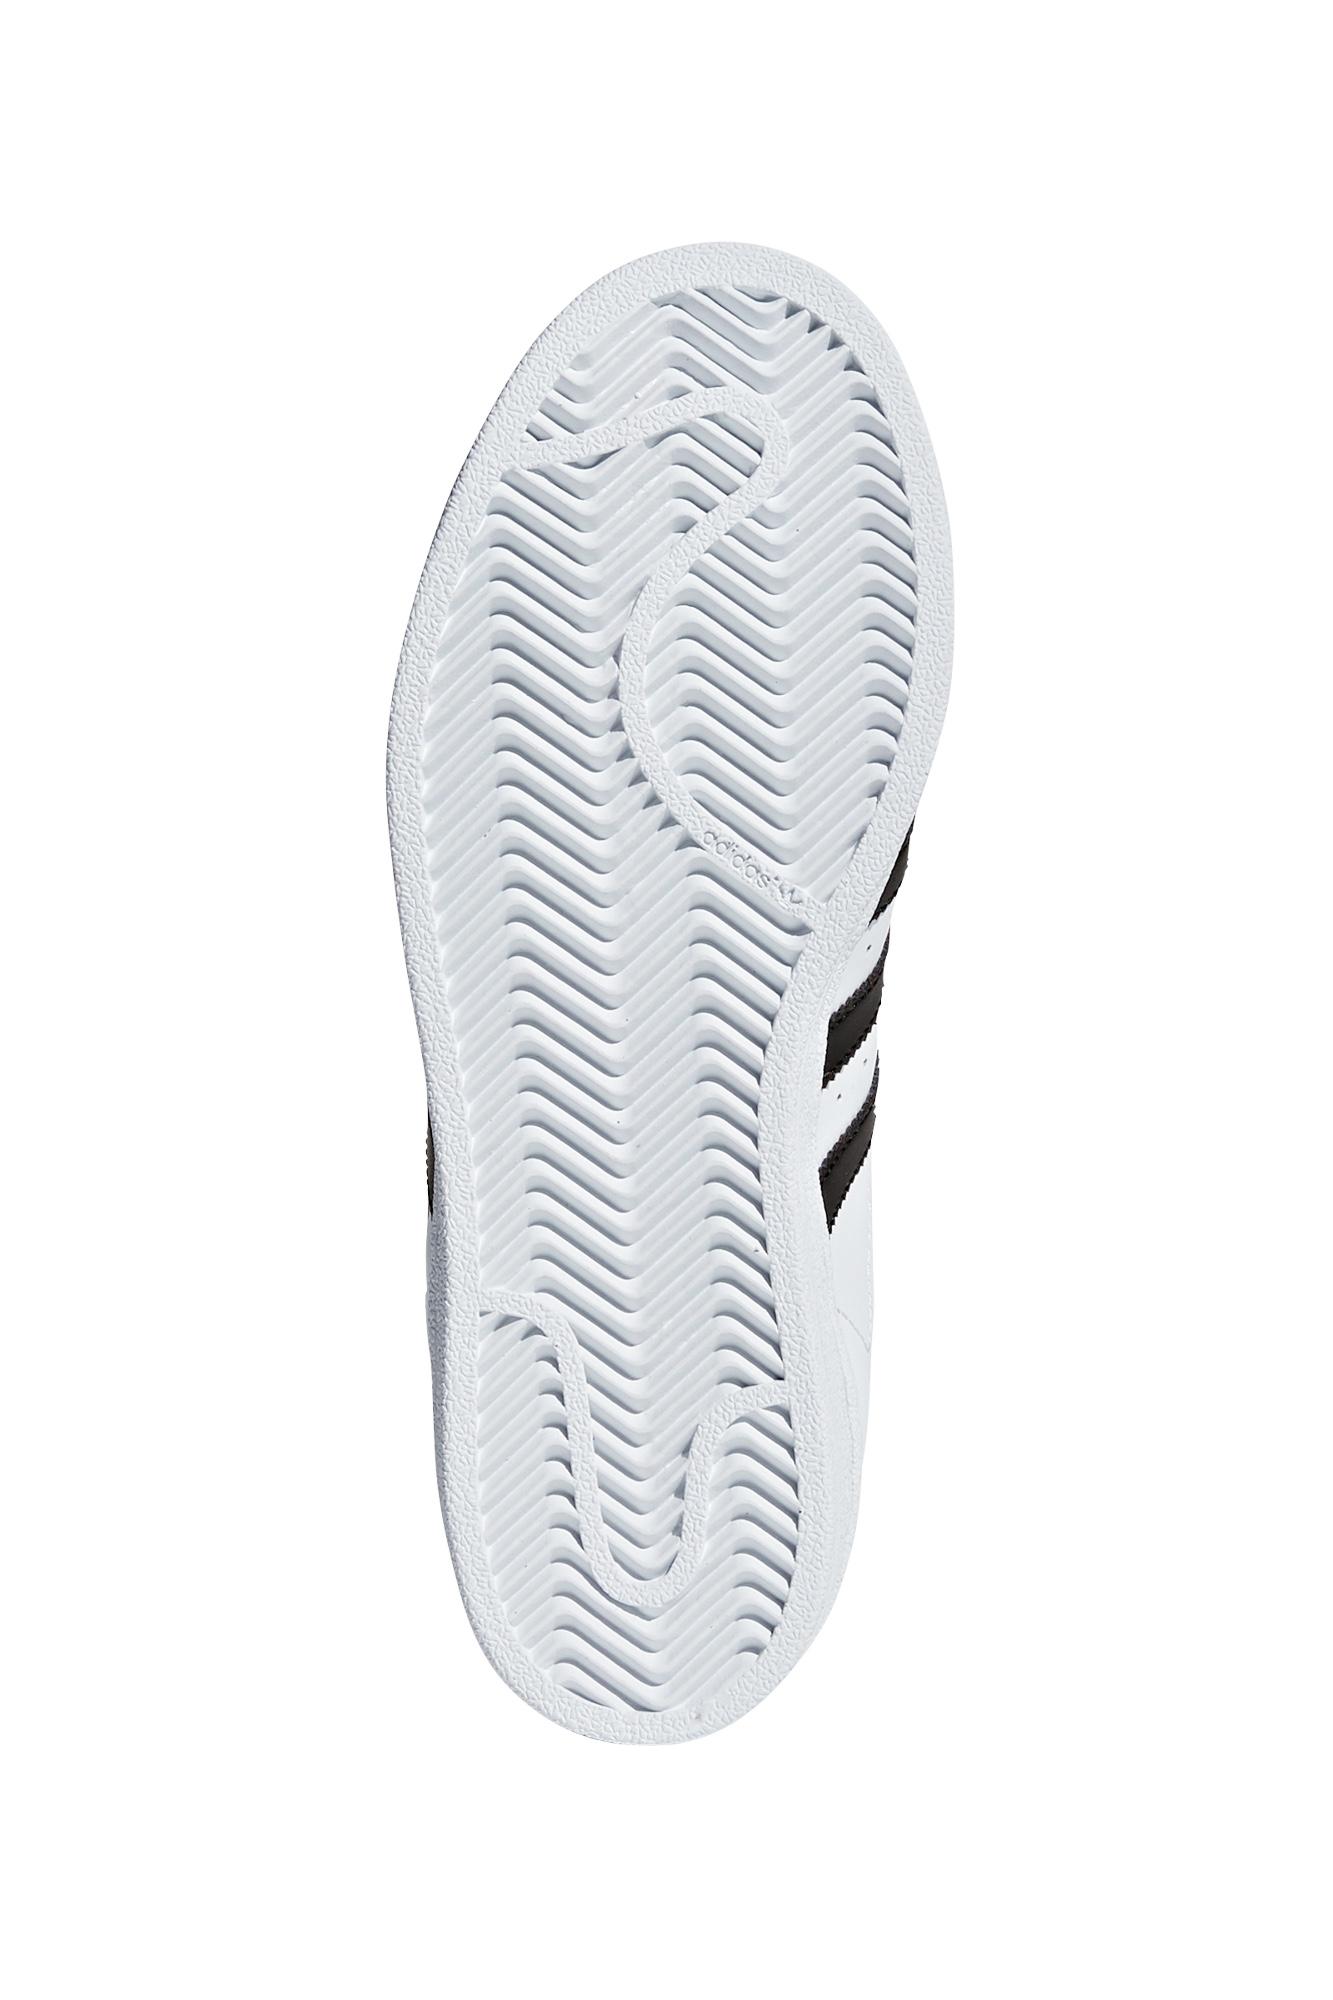 Buty adidas Originals Superstar Foundation C77154 Na co